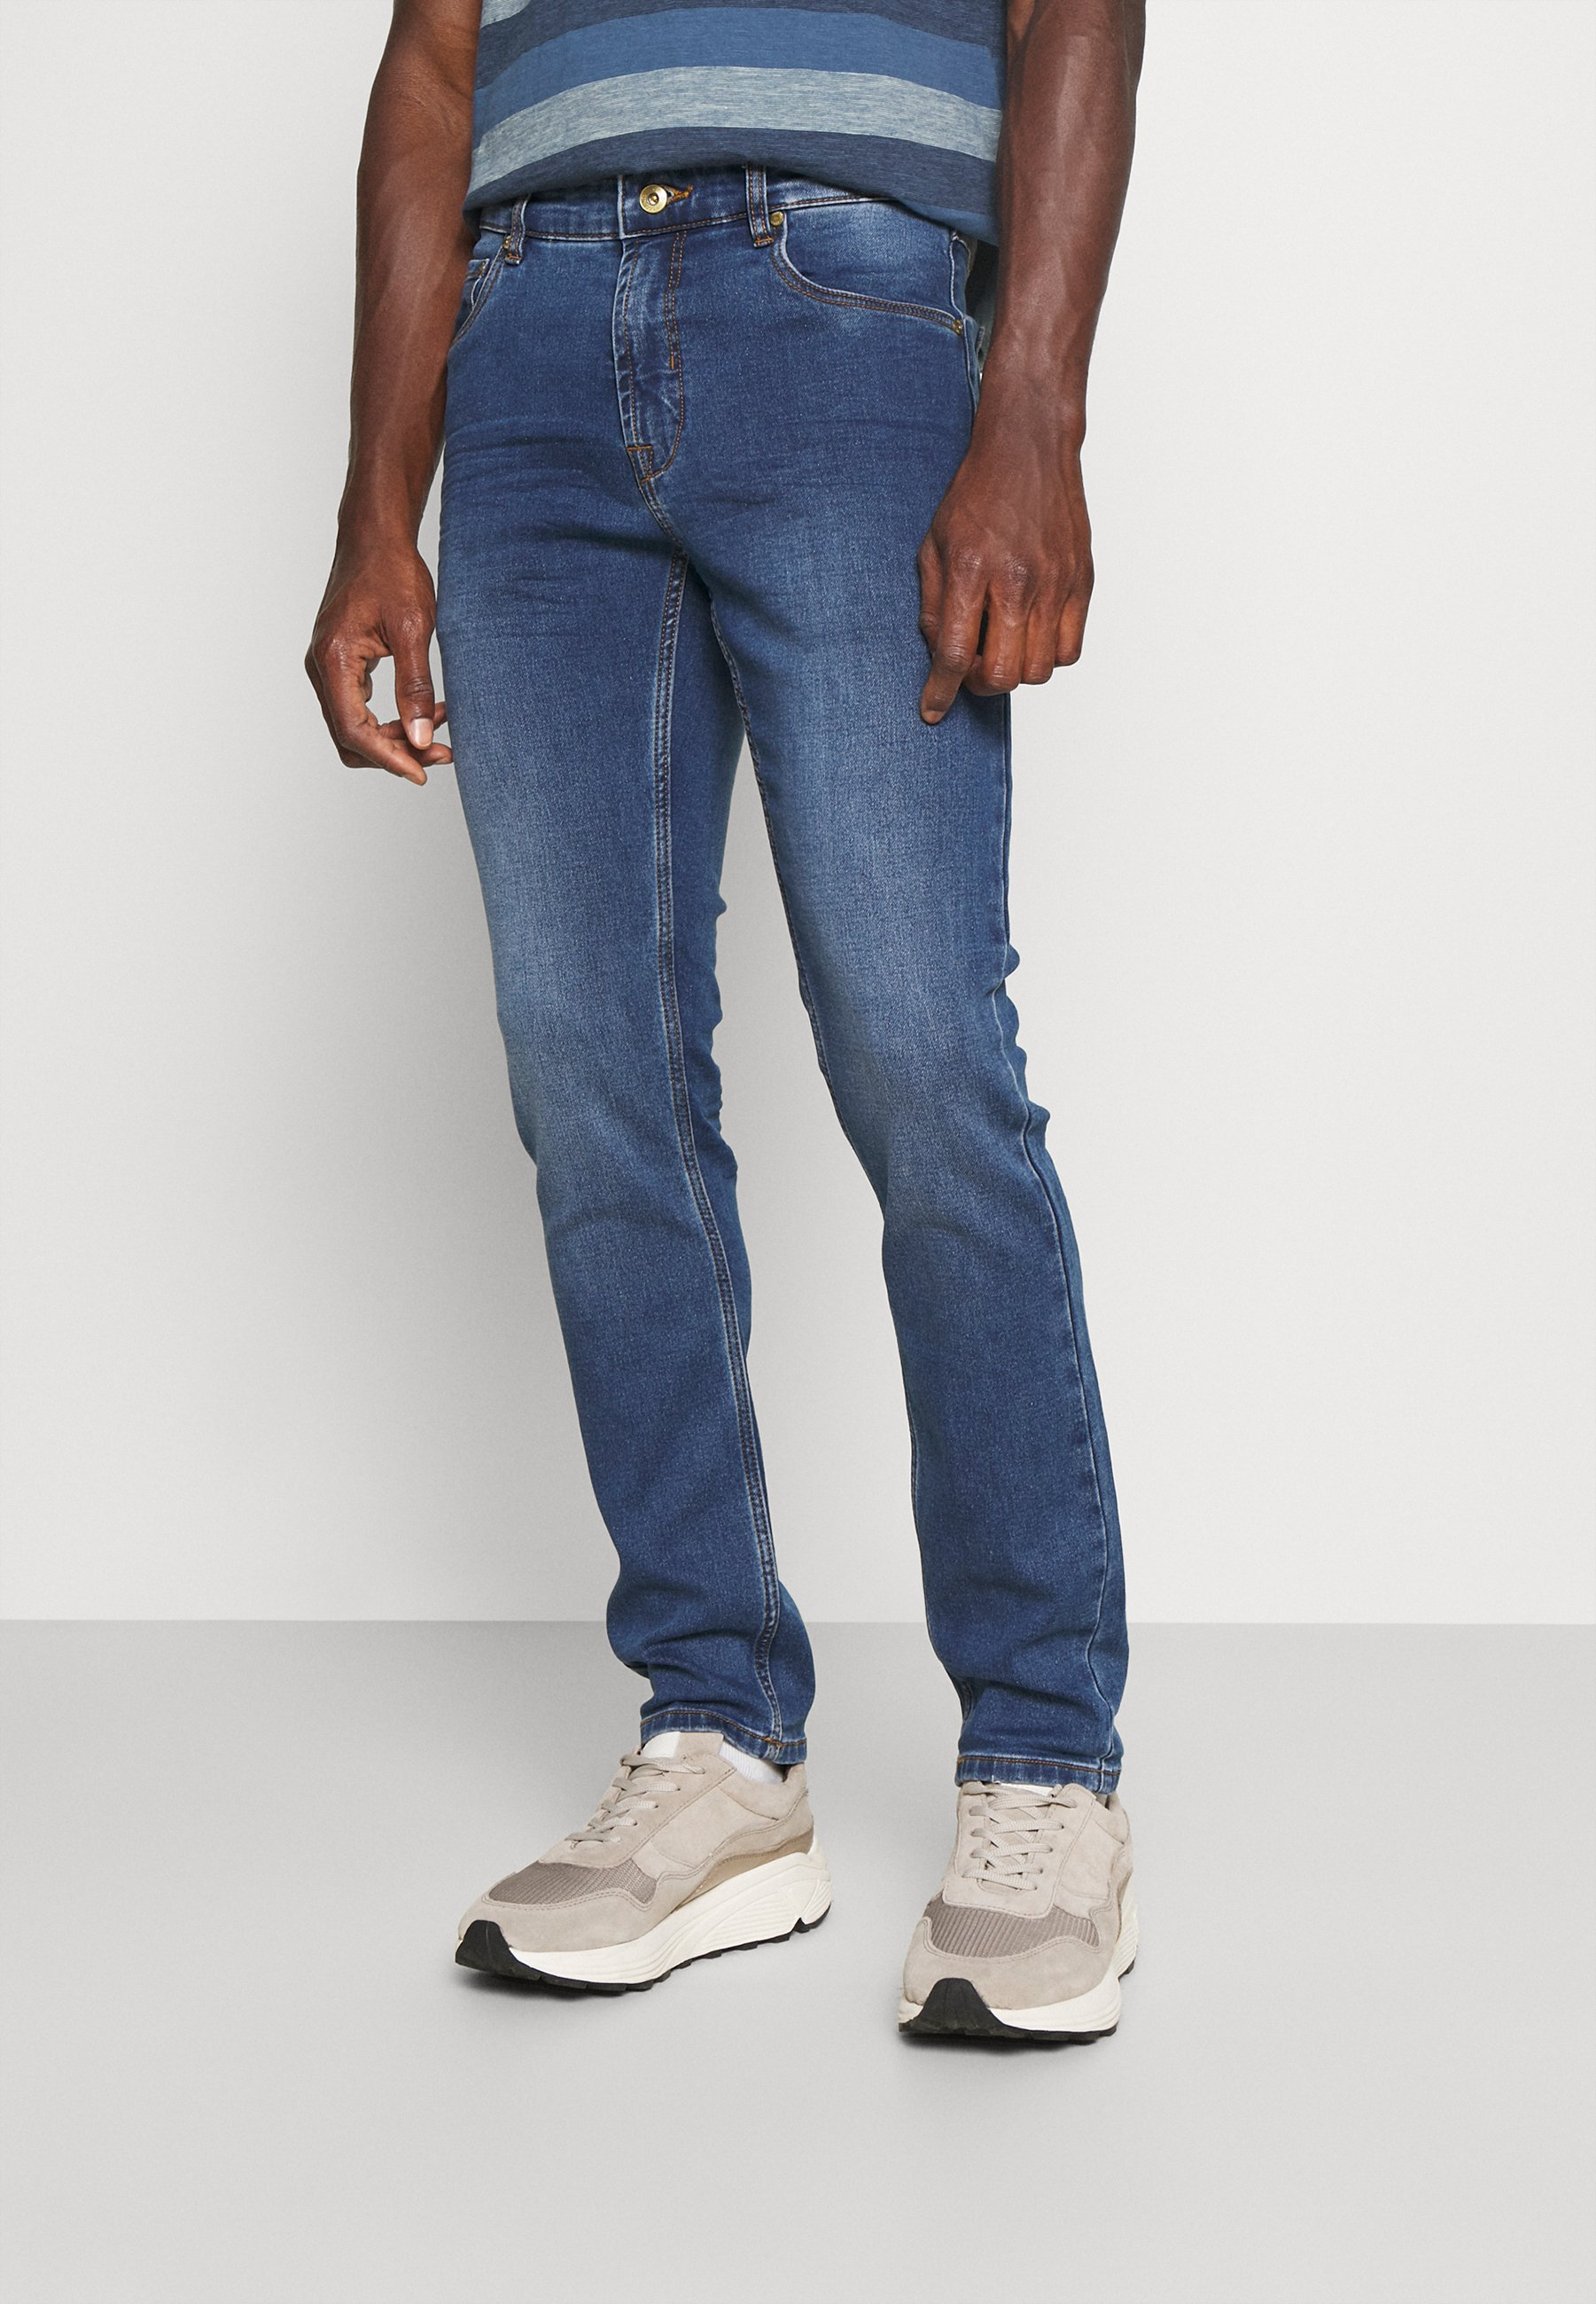 Uomo TULIO JOY HYBRID - Jeans a sigaretta